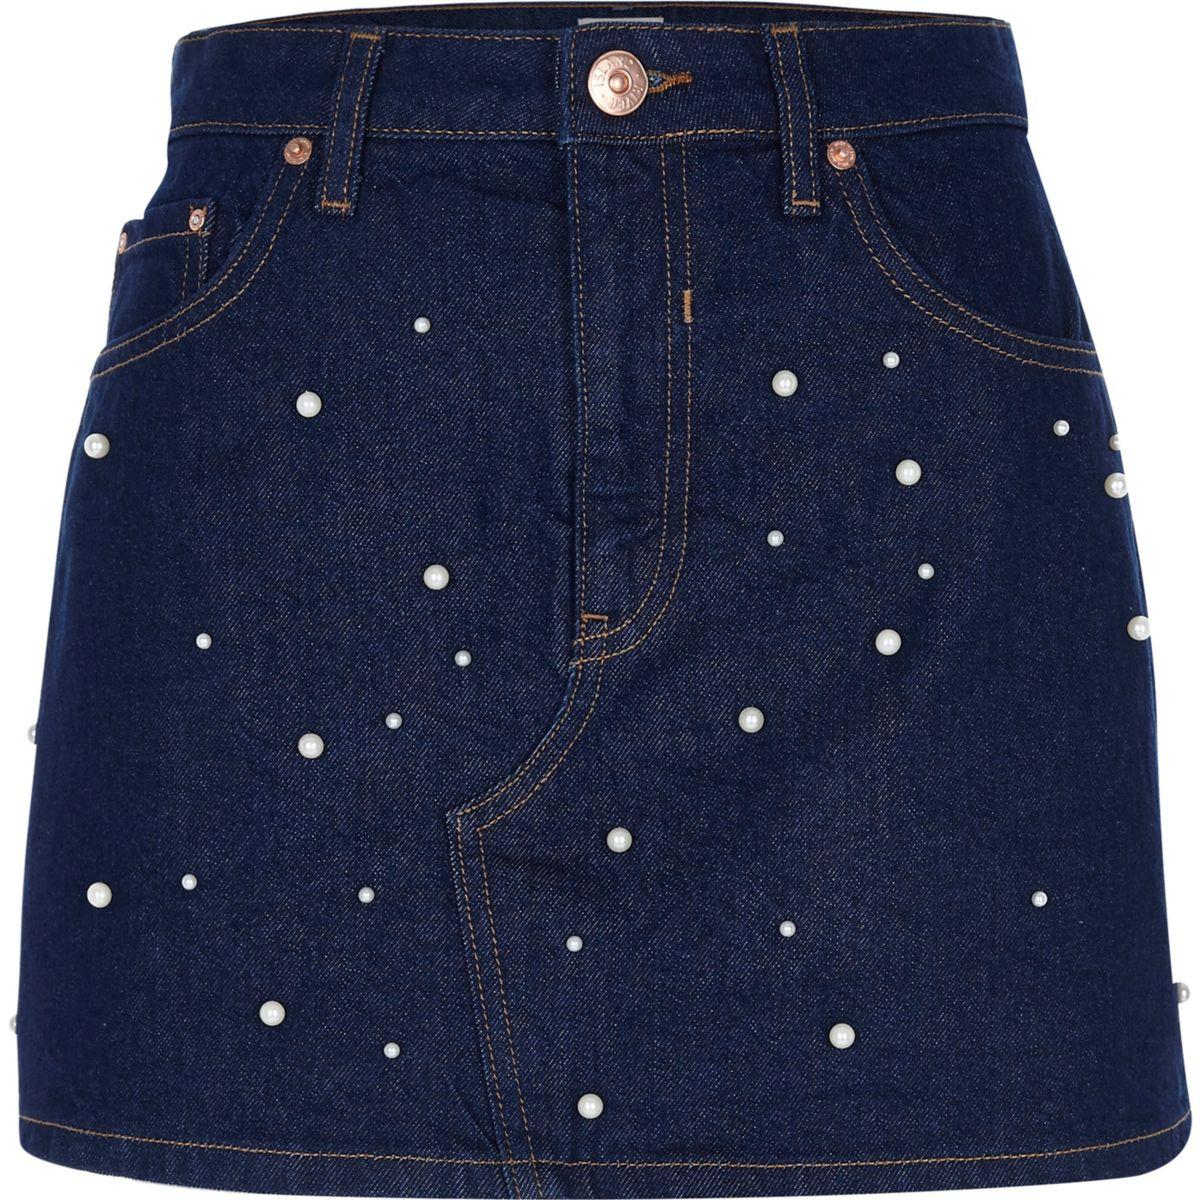 Dark blue pearl embellished denim skirt